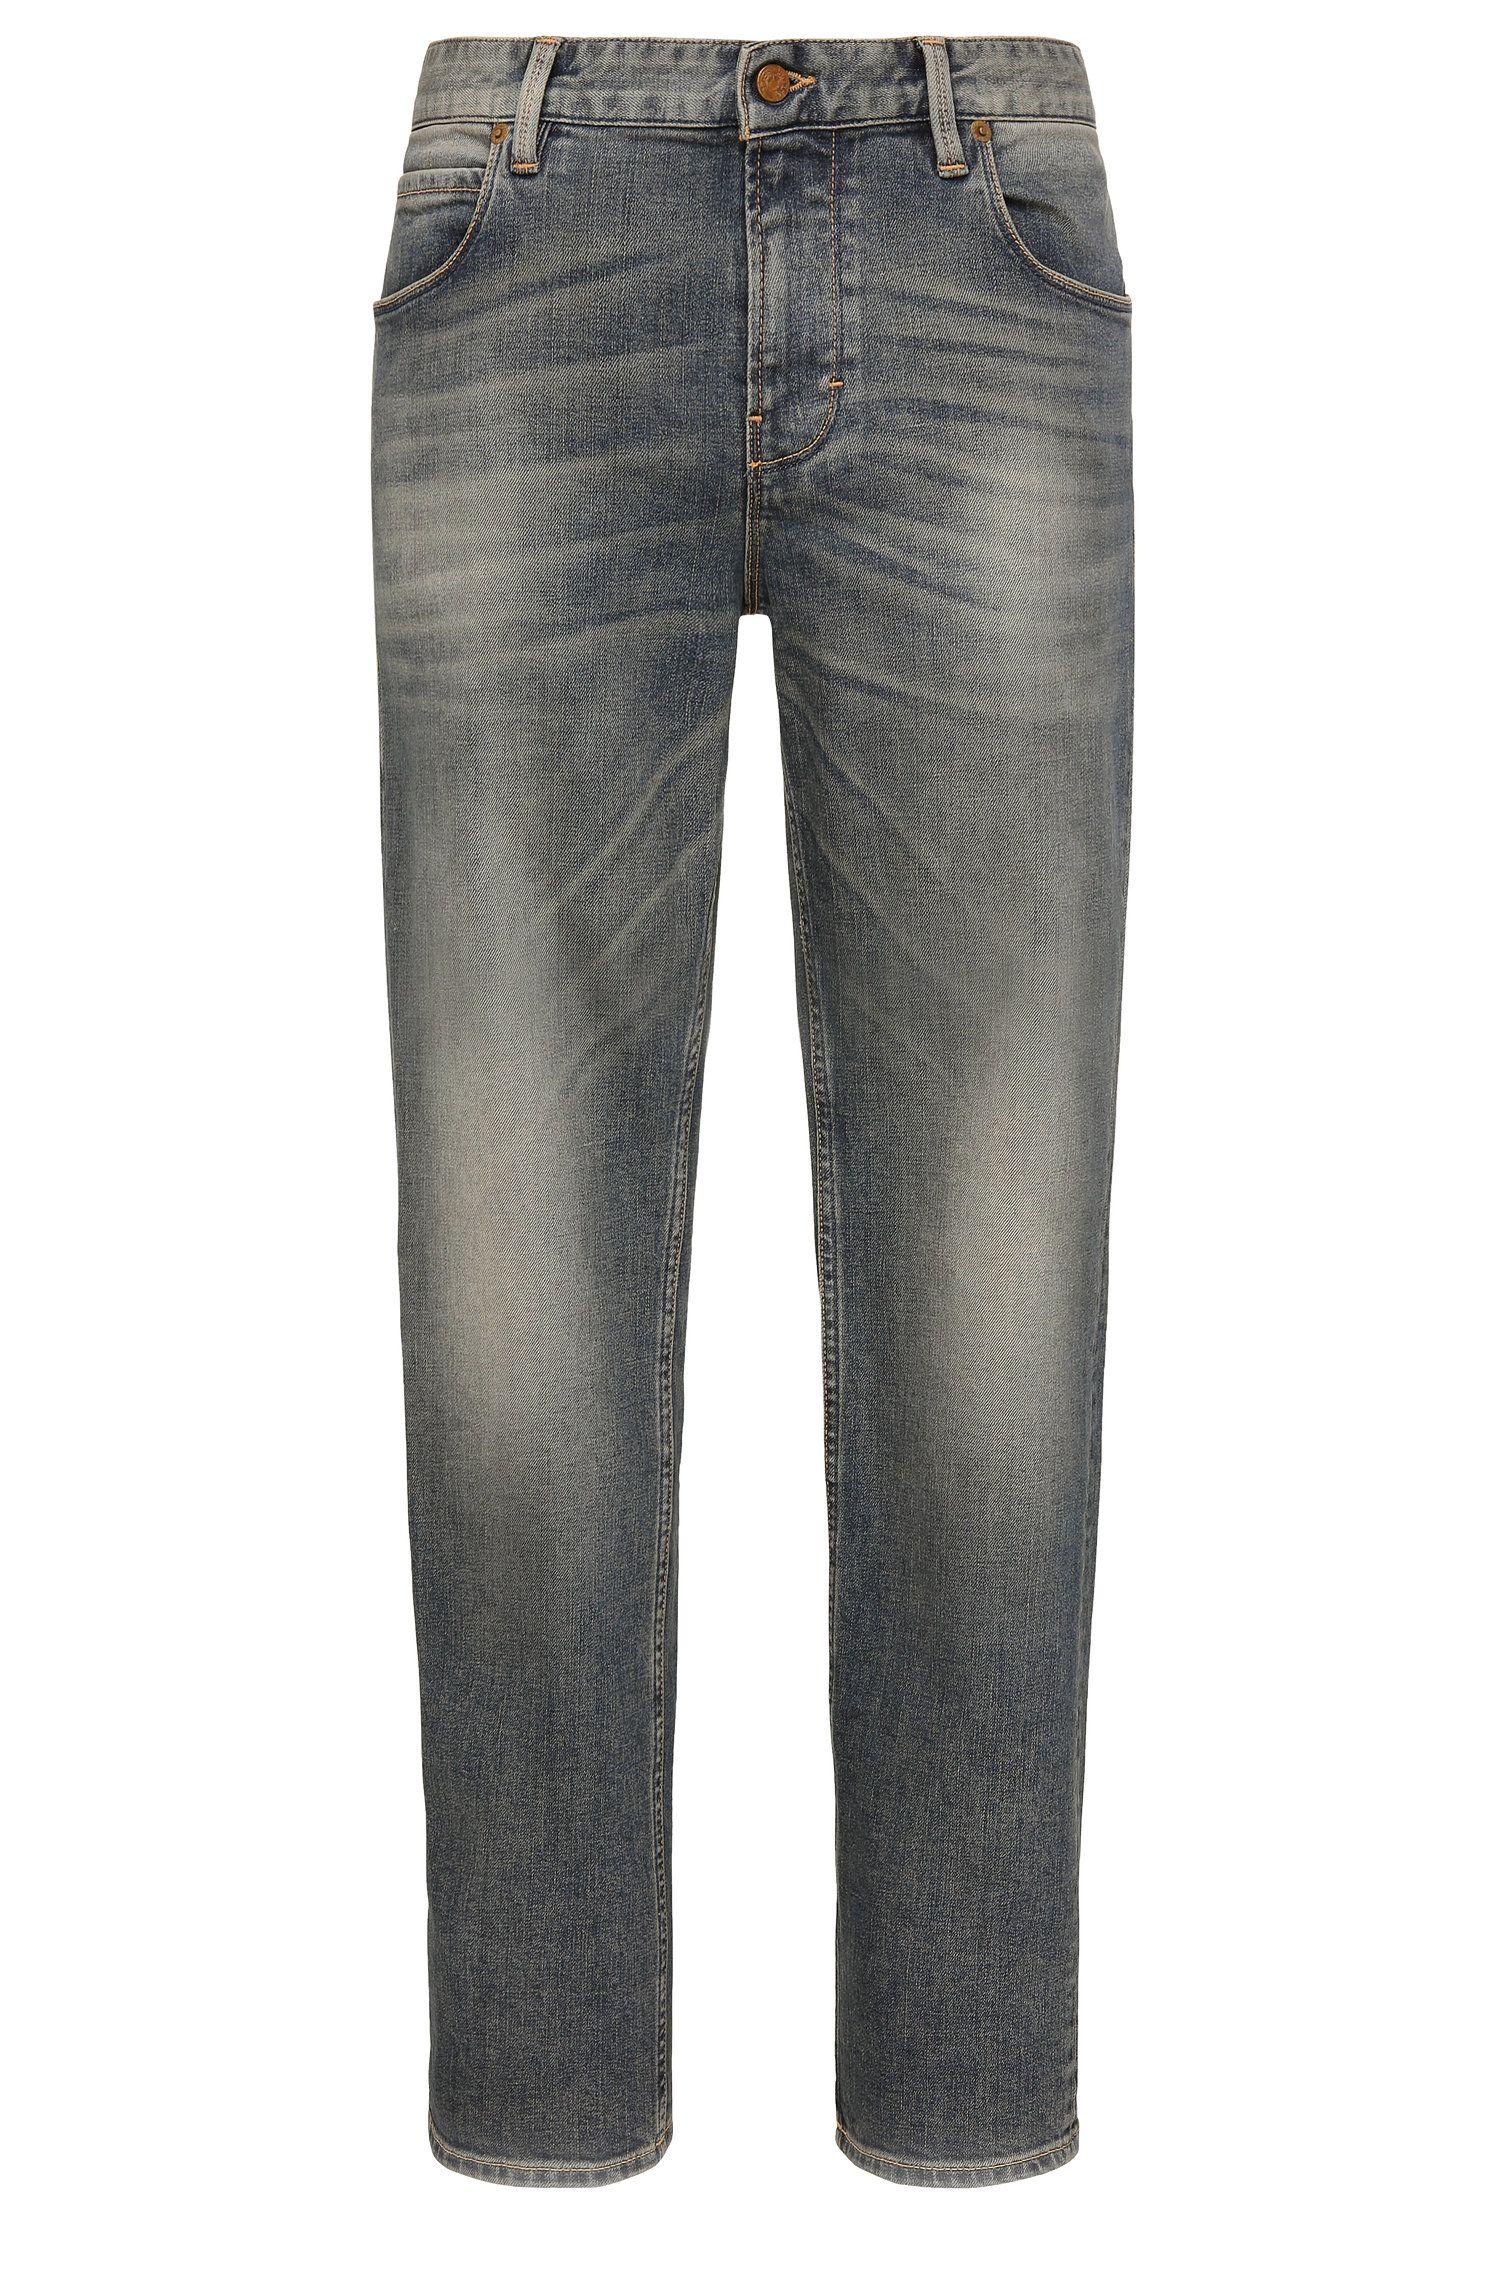 'Orange63'   Slim Fit, 13 oz Stretch Cotton Jeans